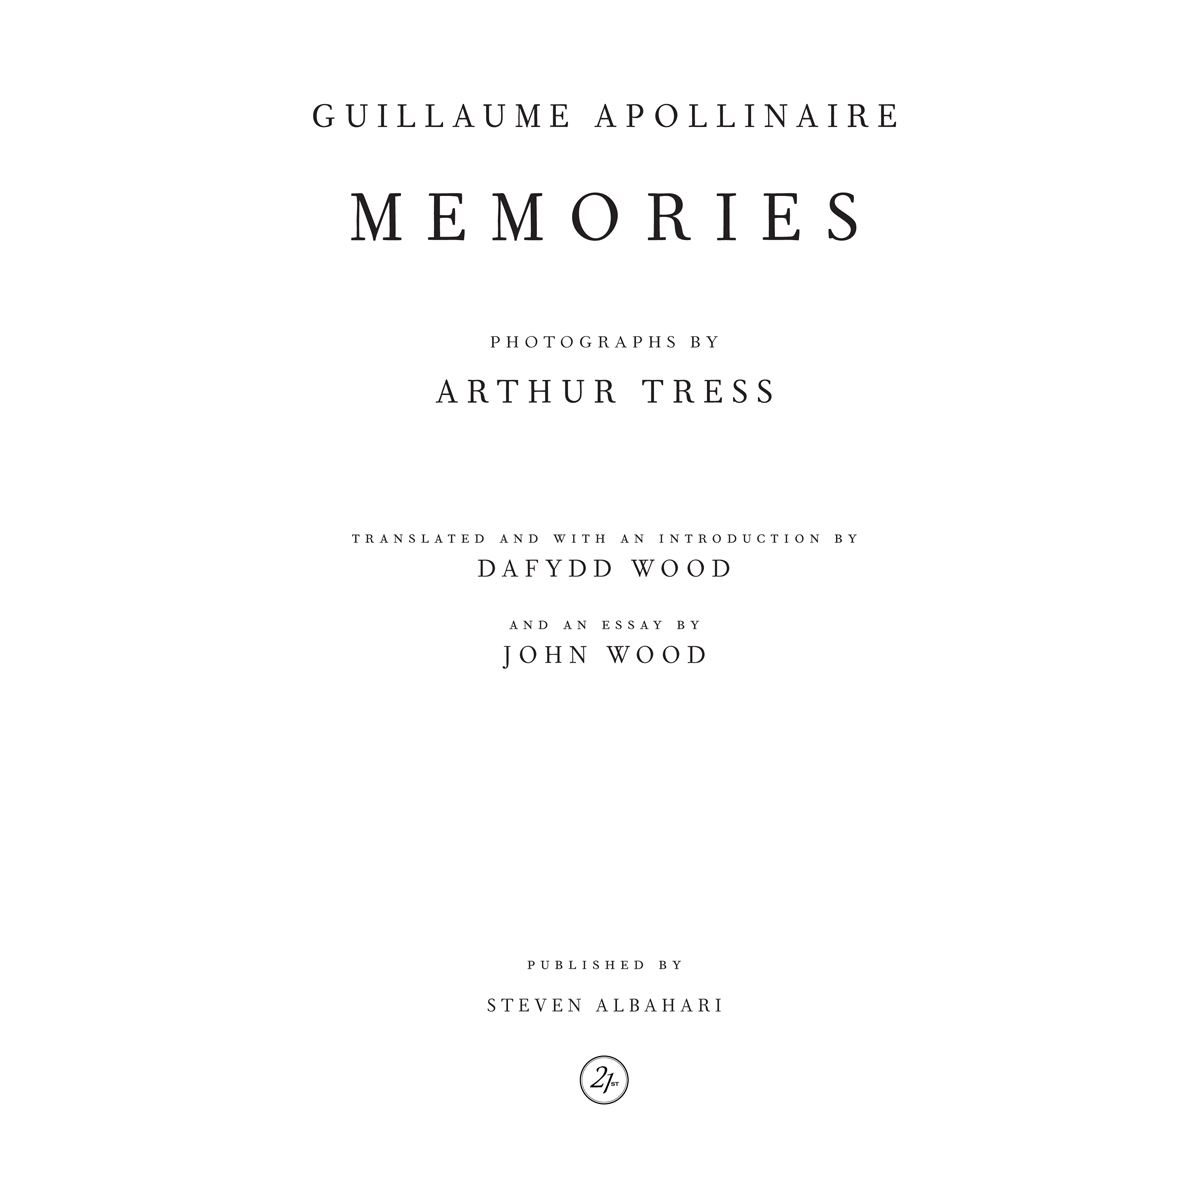 Guillaume Apollinaire, Memories